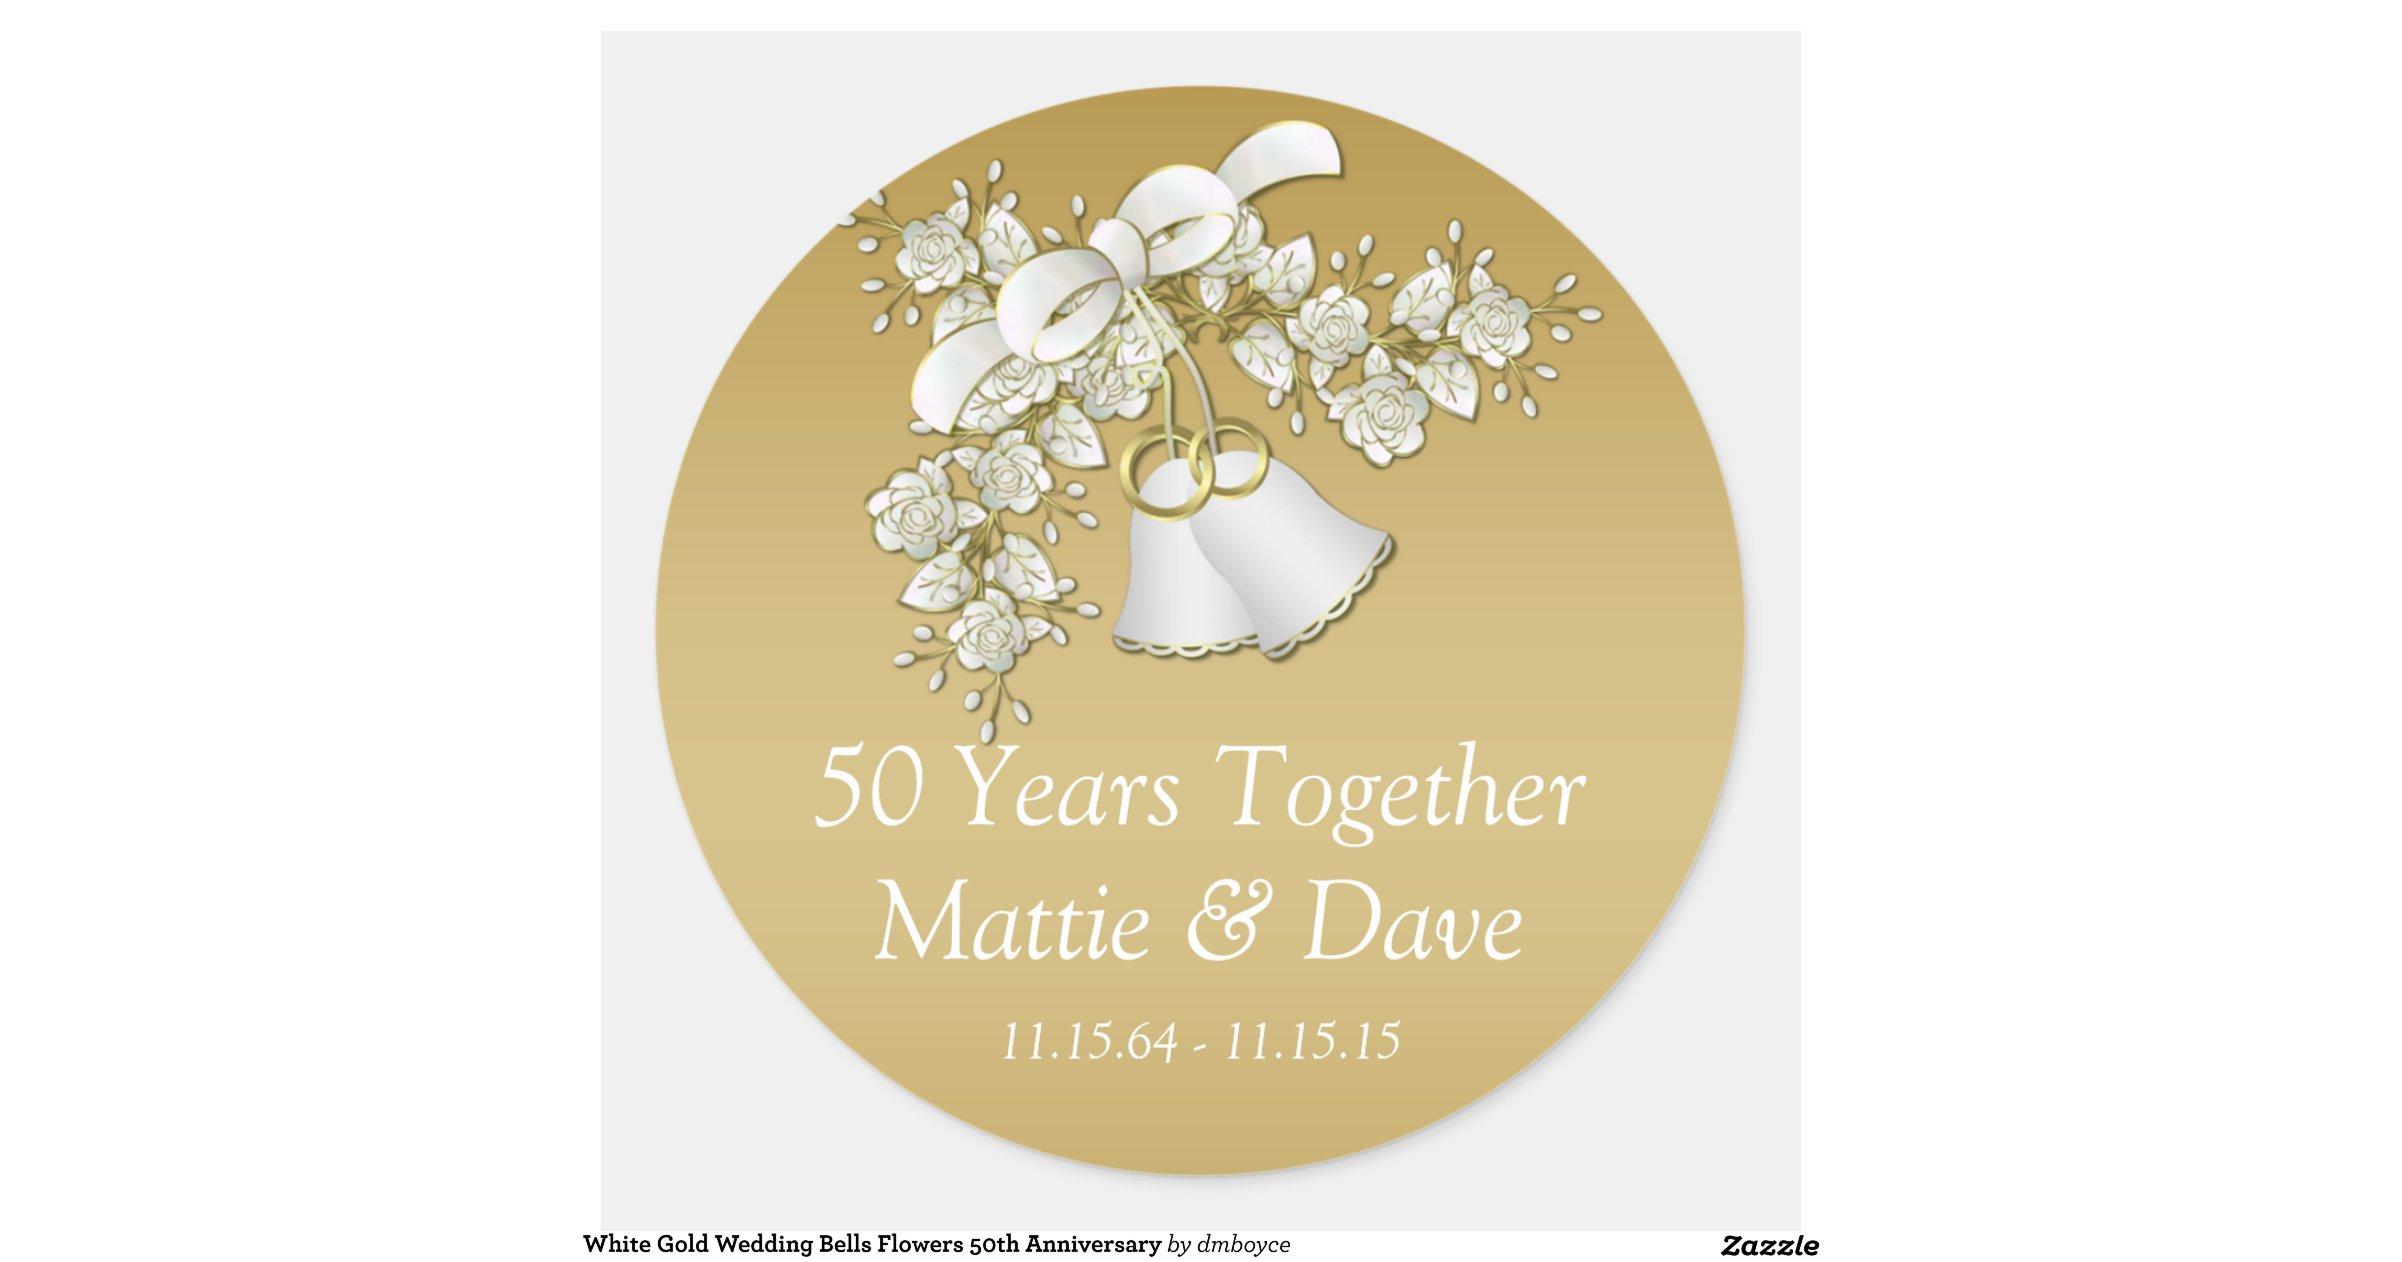 white gold wedding bells flowers 50th anniversary classic